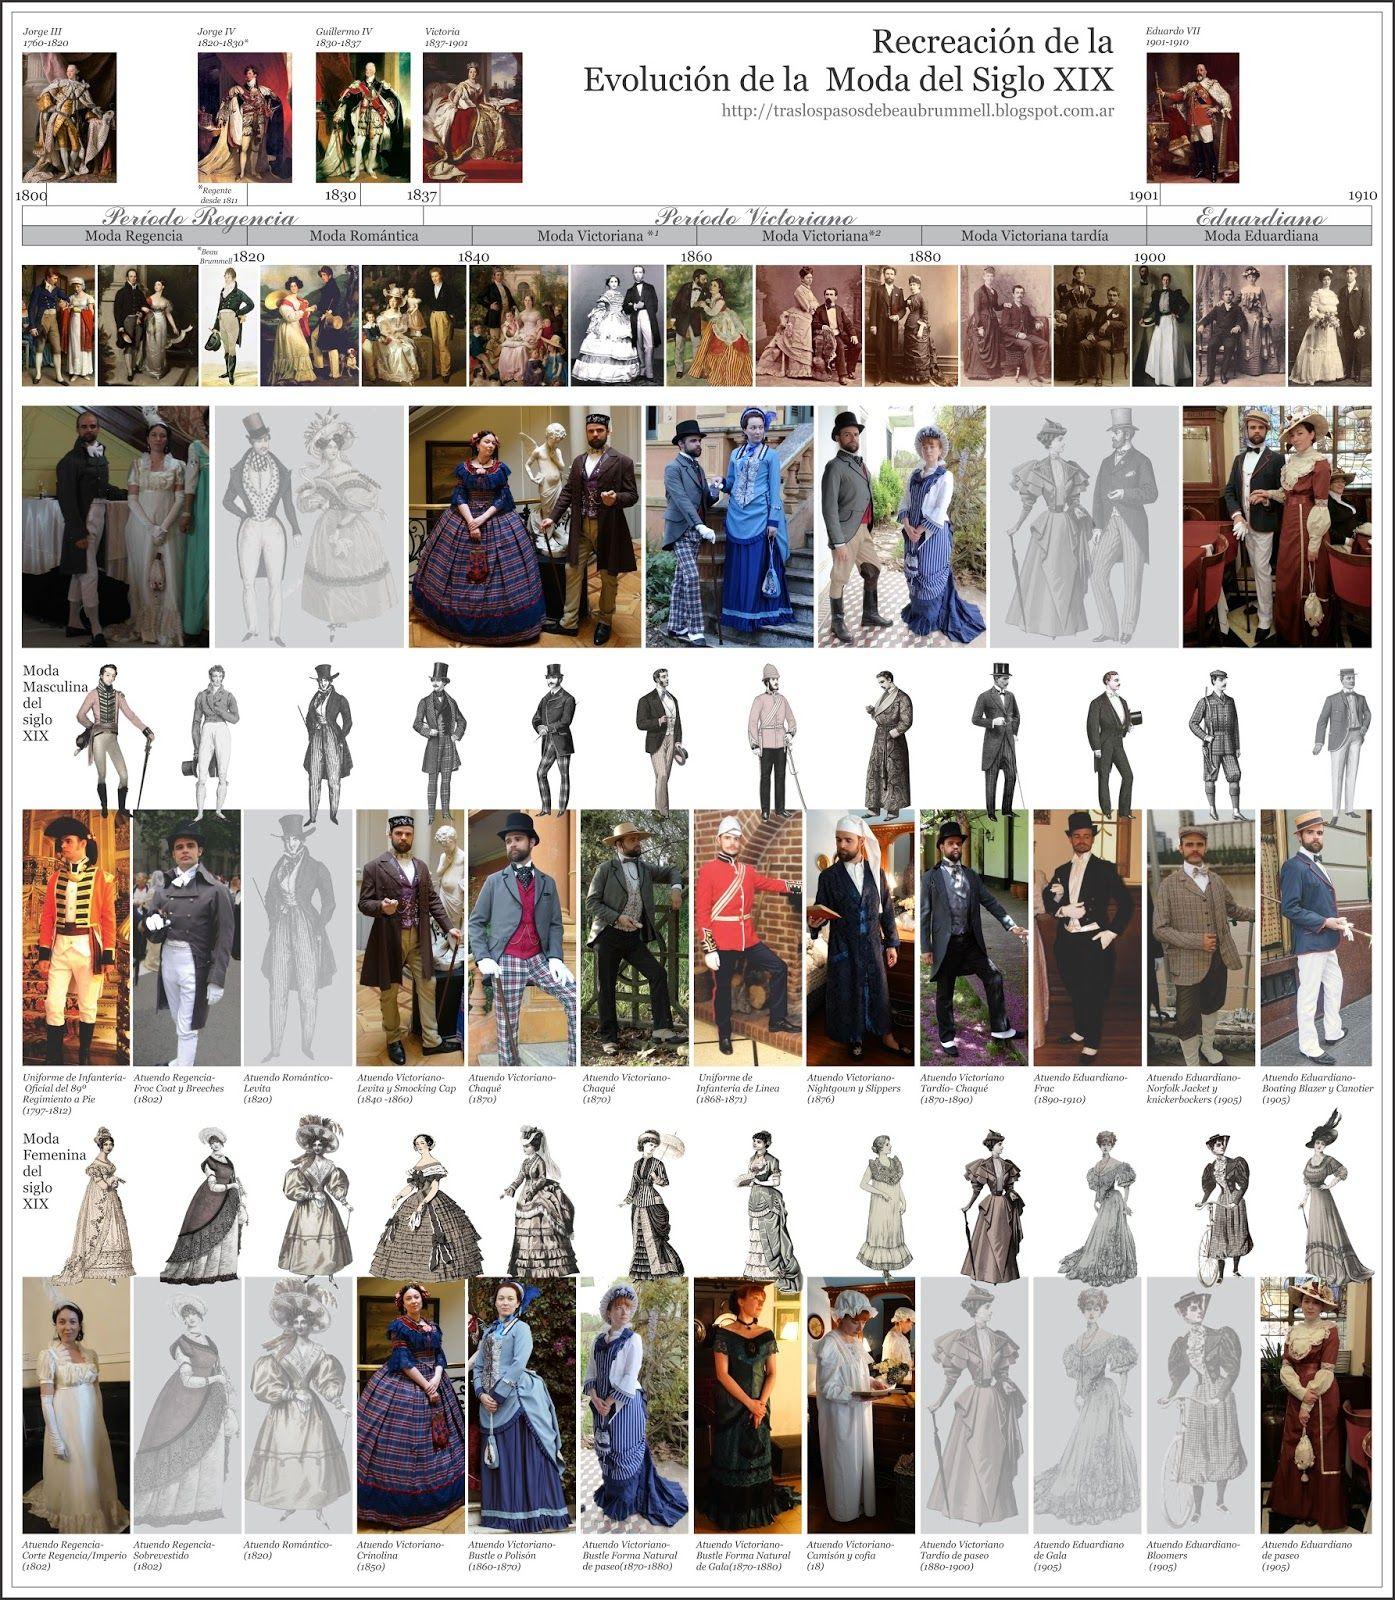 Decidi Completar La Linea De Tiempo De La Evolucion De La Moda Del Siglo Xix Tanto Masculina Como Femenina Para La Moda Del Siglo Xix Moda Historia De La Moda